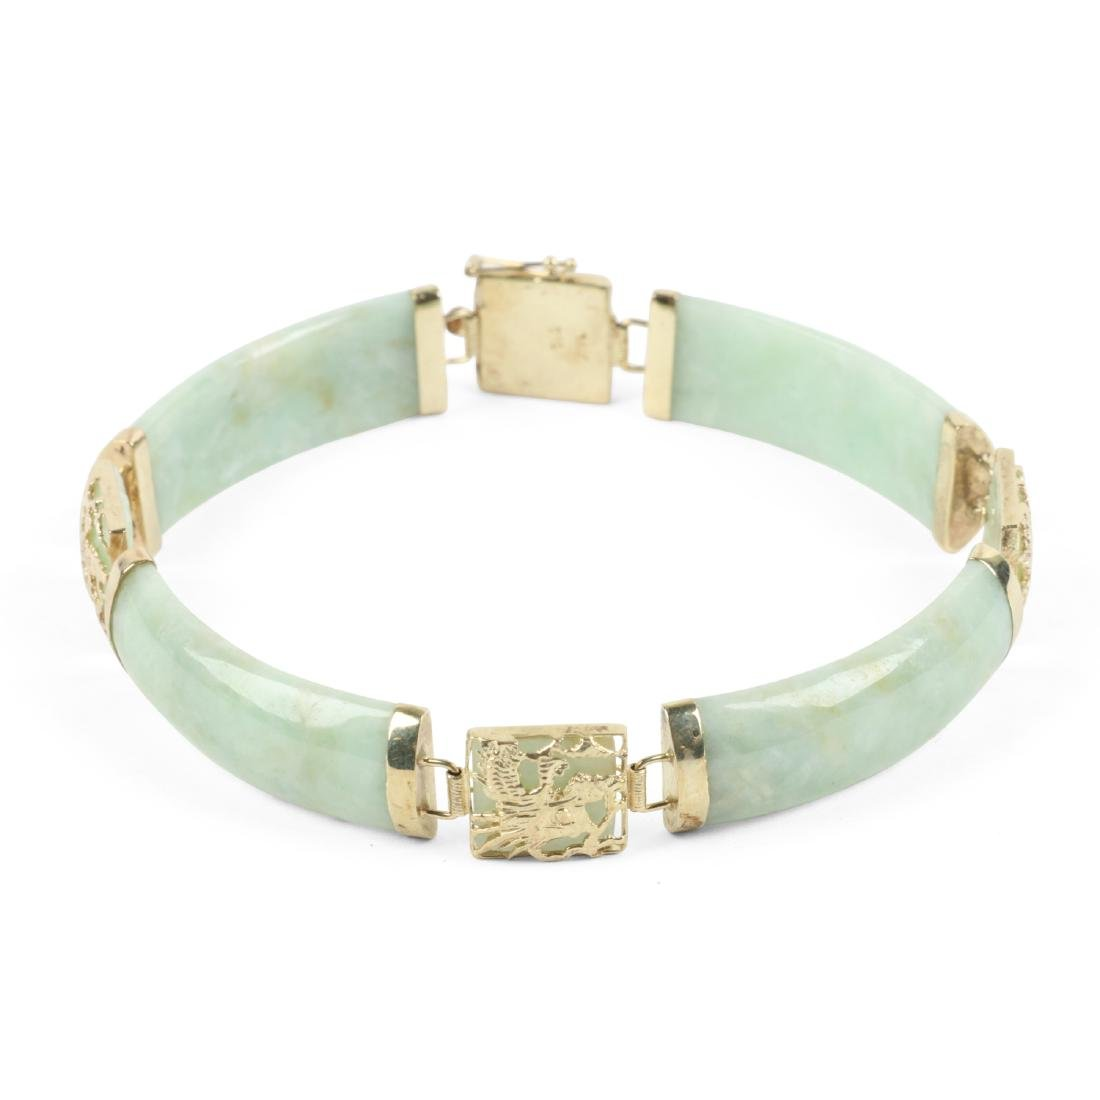 A 14K Yellow Gold & Jade Bracelet